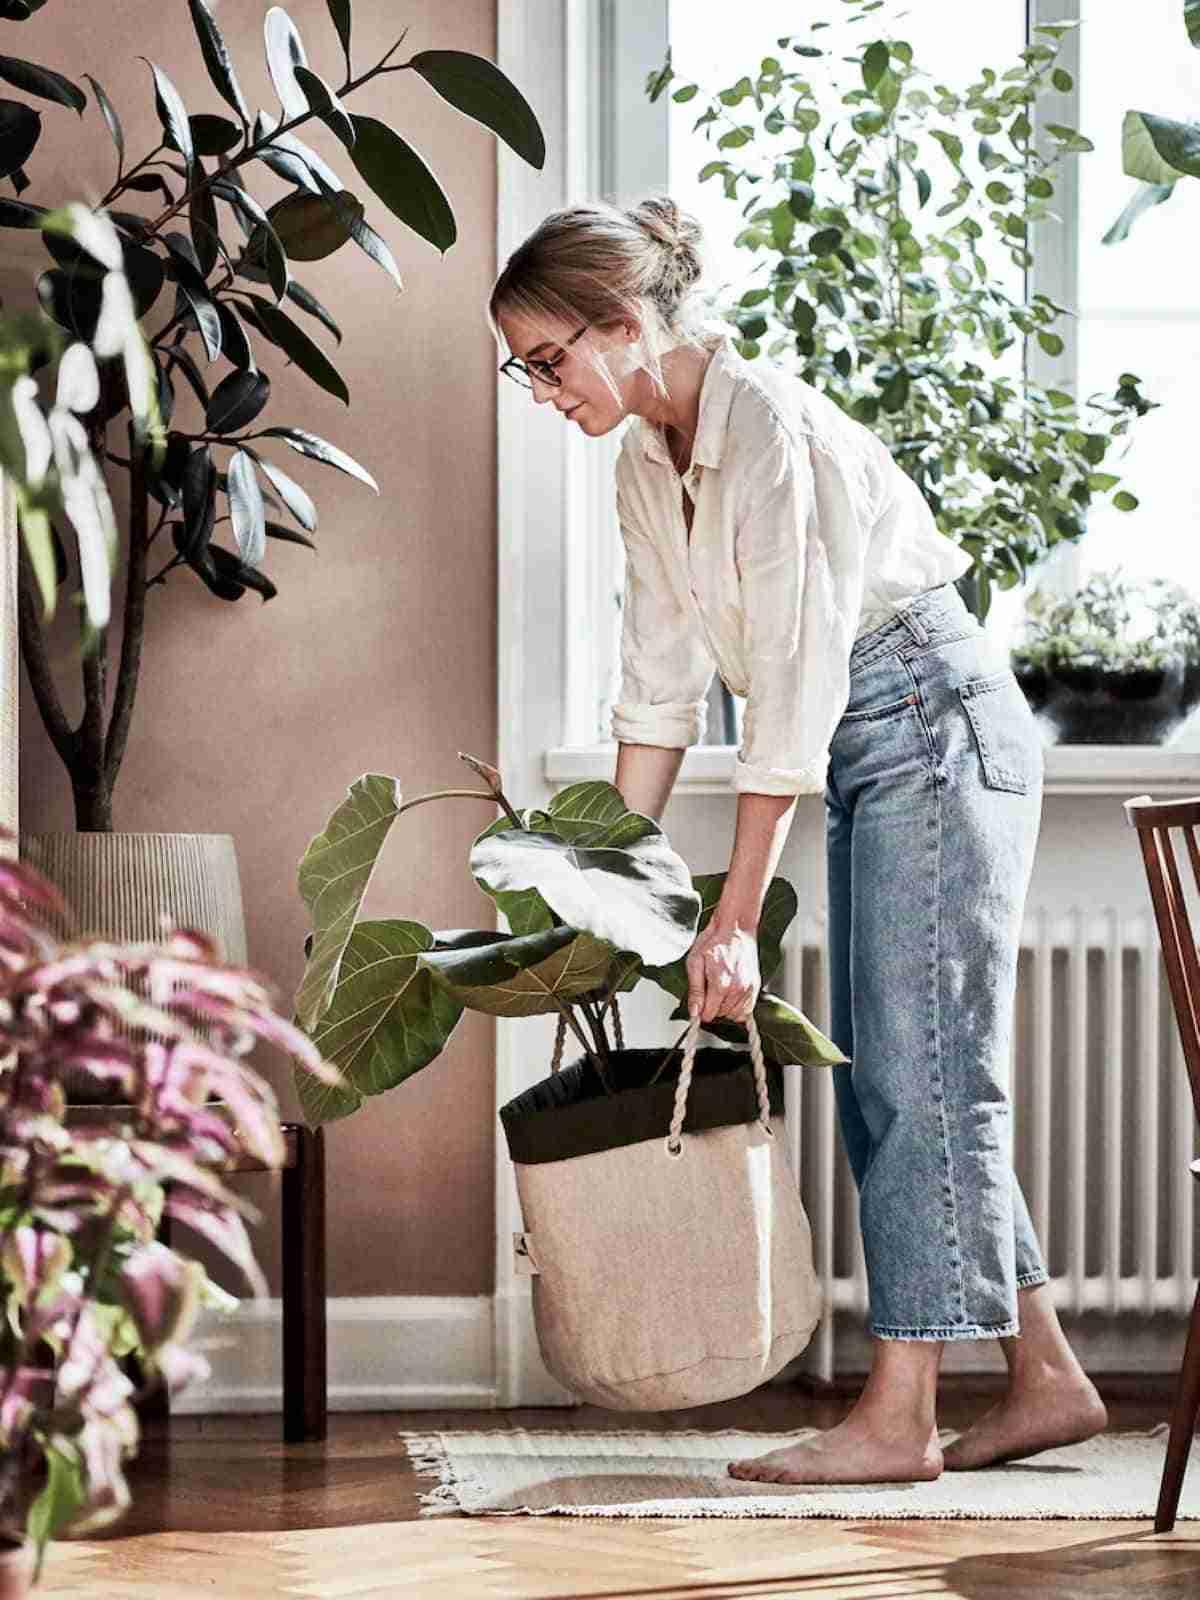 jardineria urbana con botanisk de ikea